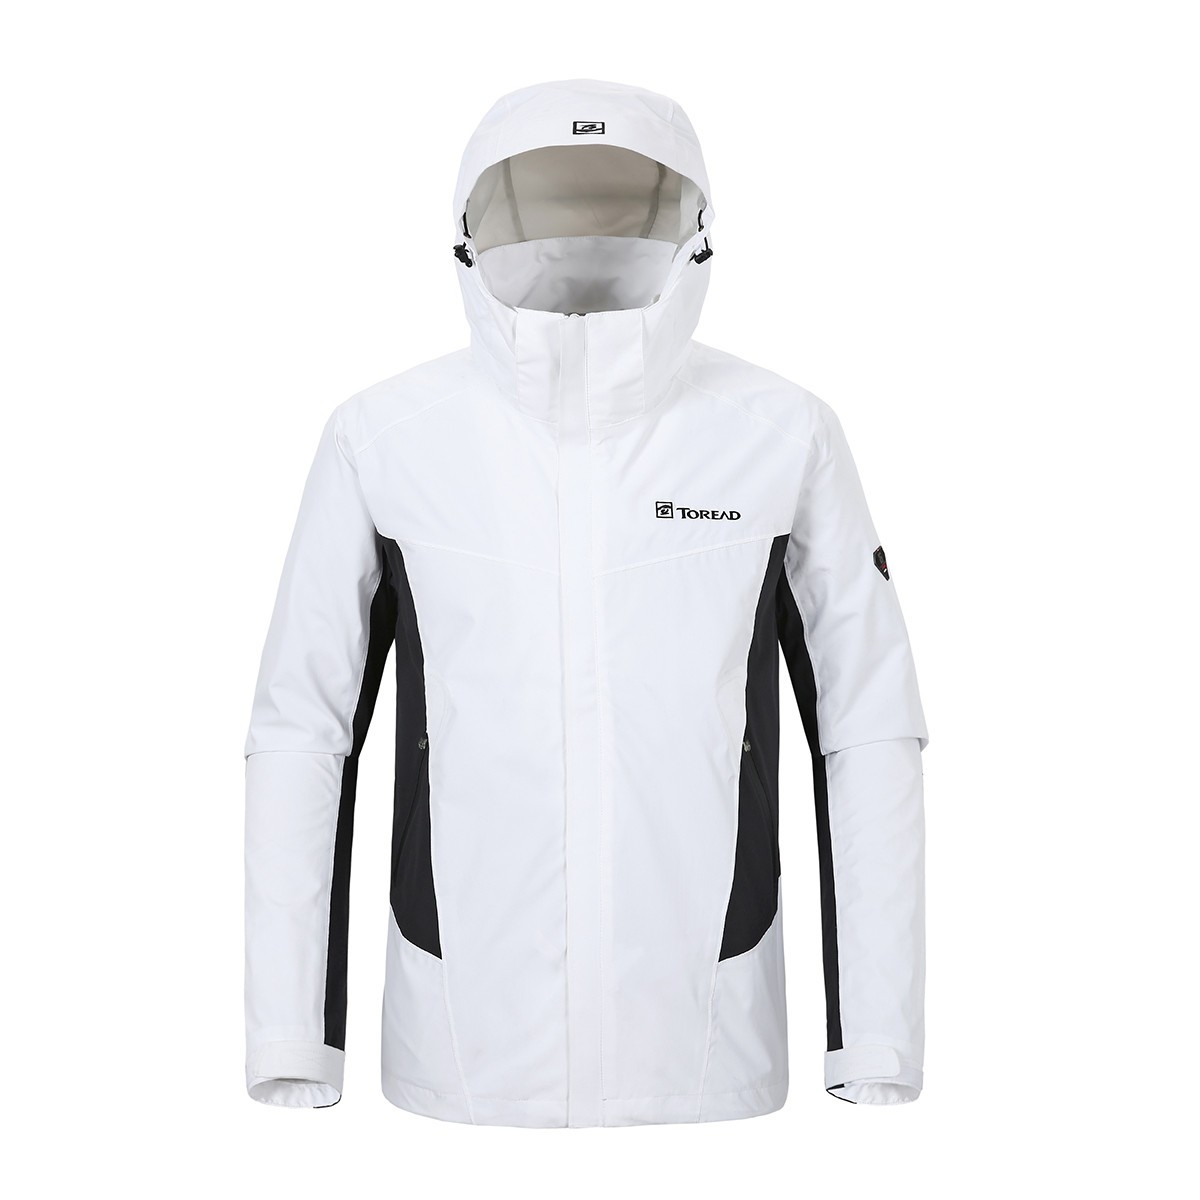 TOREAD 探路者 KABG8164 男士冲锋衣